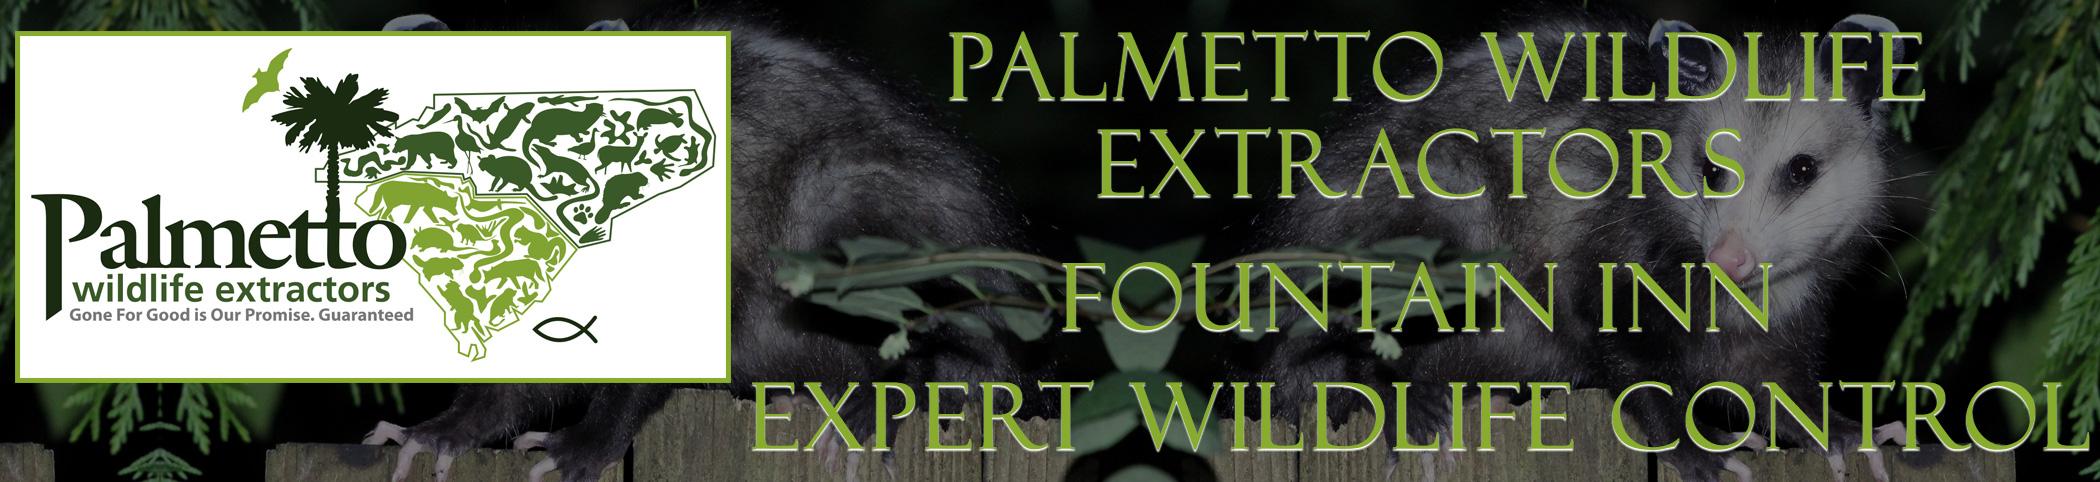 Palmetto Wildlife Extractors Fountain Inn south carolina header image